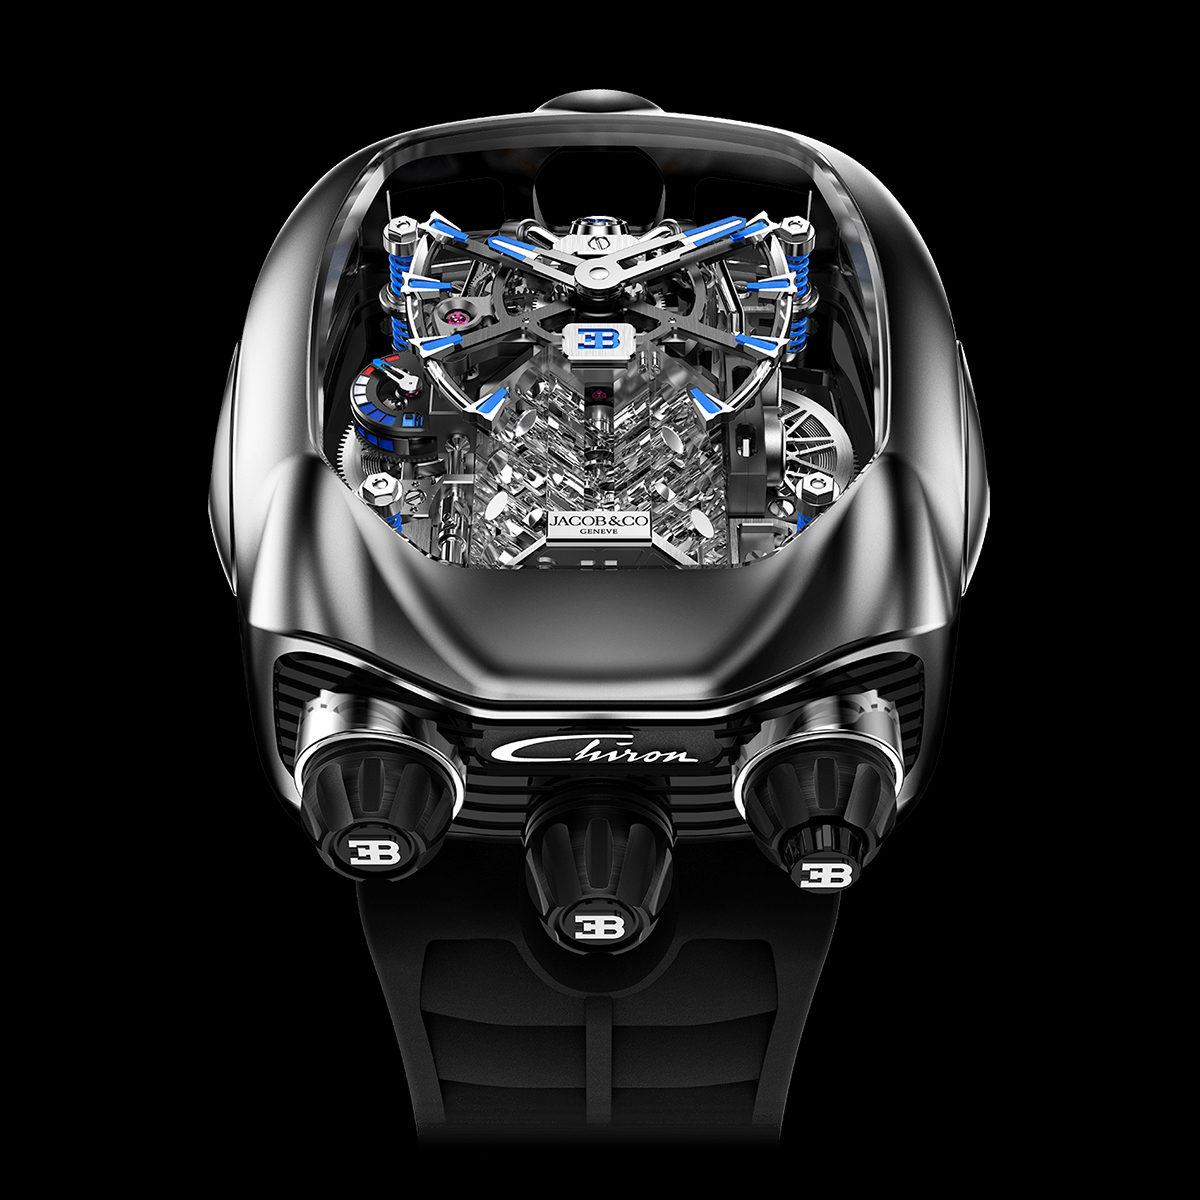 Jacob & Co. Bugatti Chiron Tourbillon Titanium | Jacob & Co.